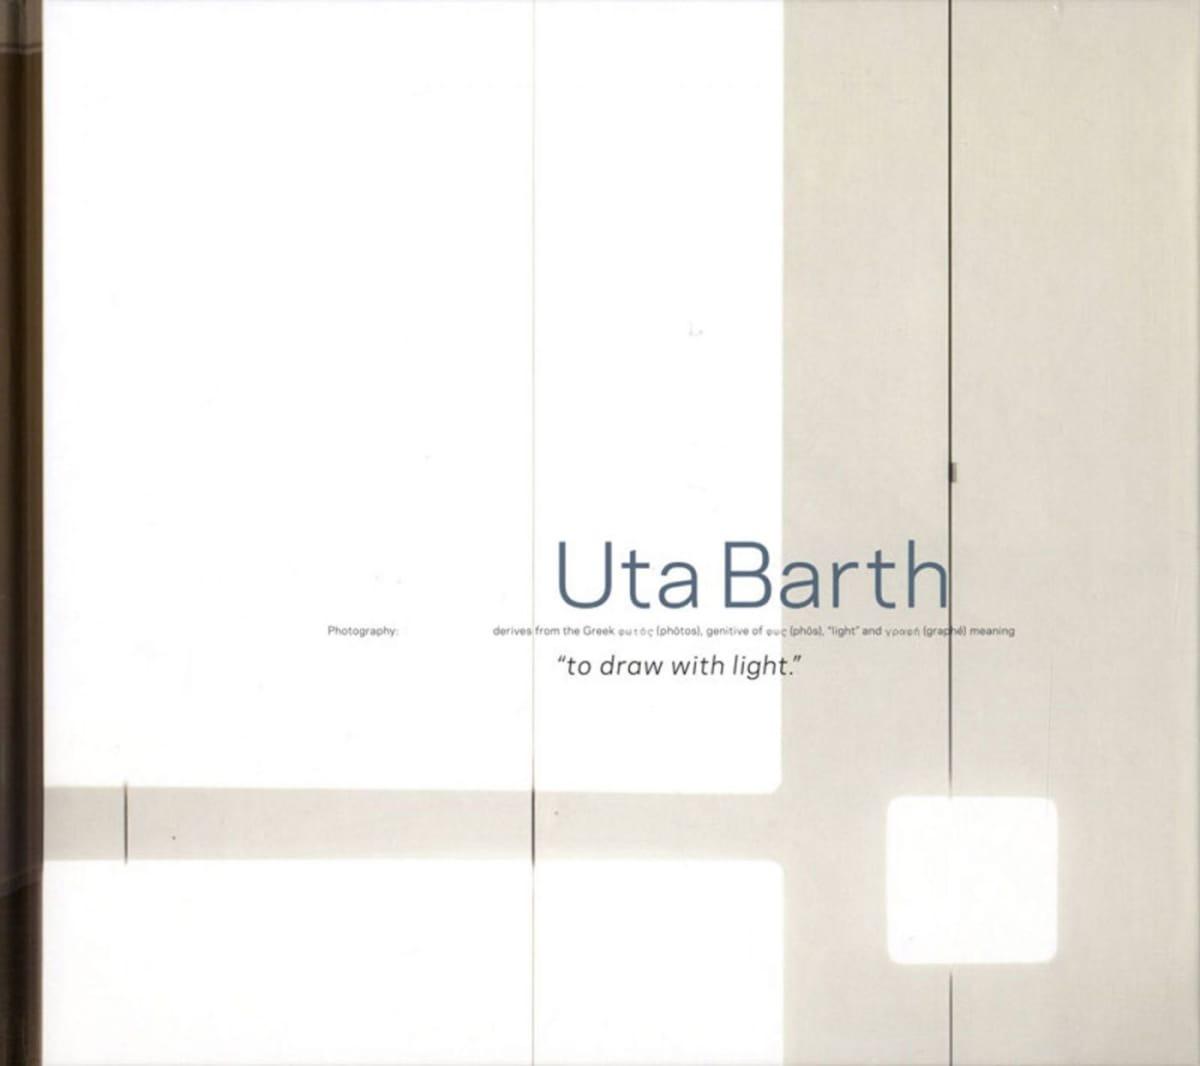 Cover of Uta Barth Blind Spot publication